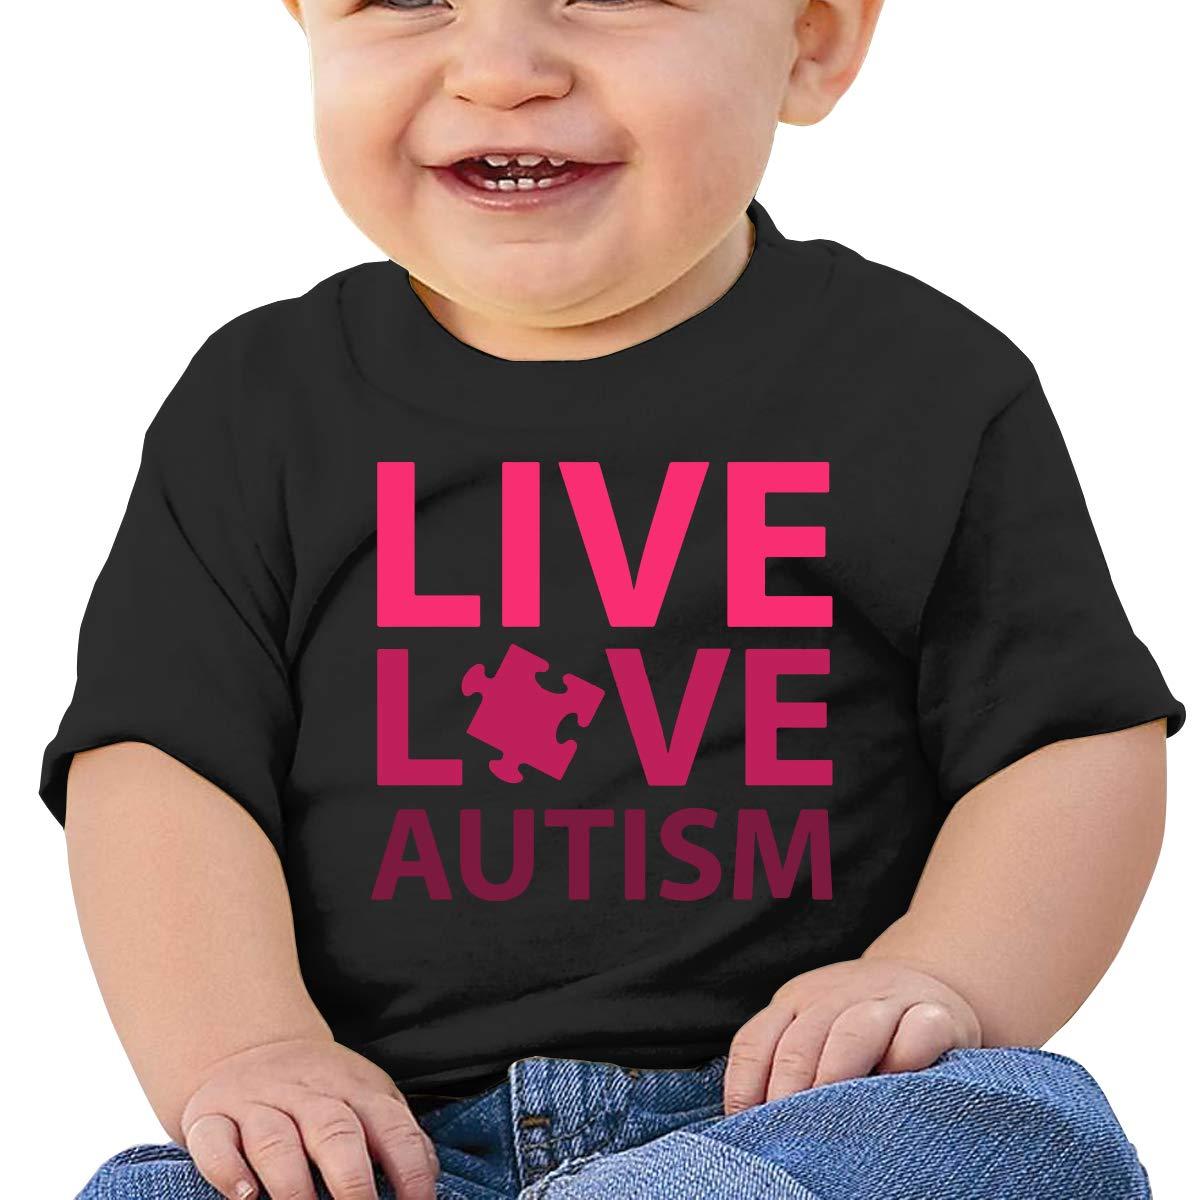 Live Love Autism Newborn Baby Short Sleeve Crewneck Tee Shirt 6-18 Month Tops